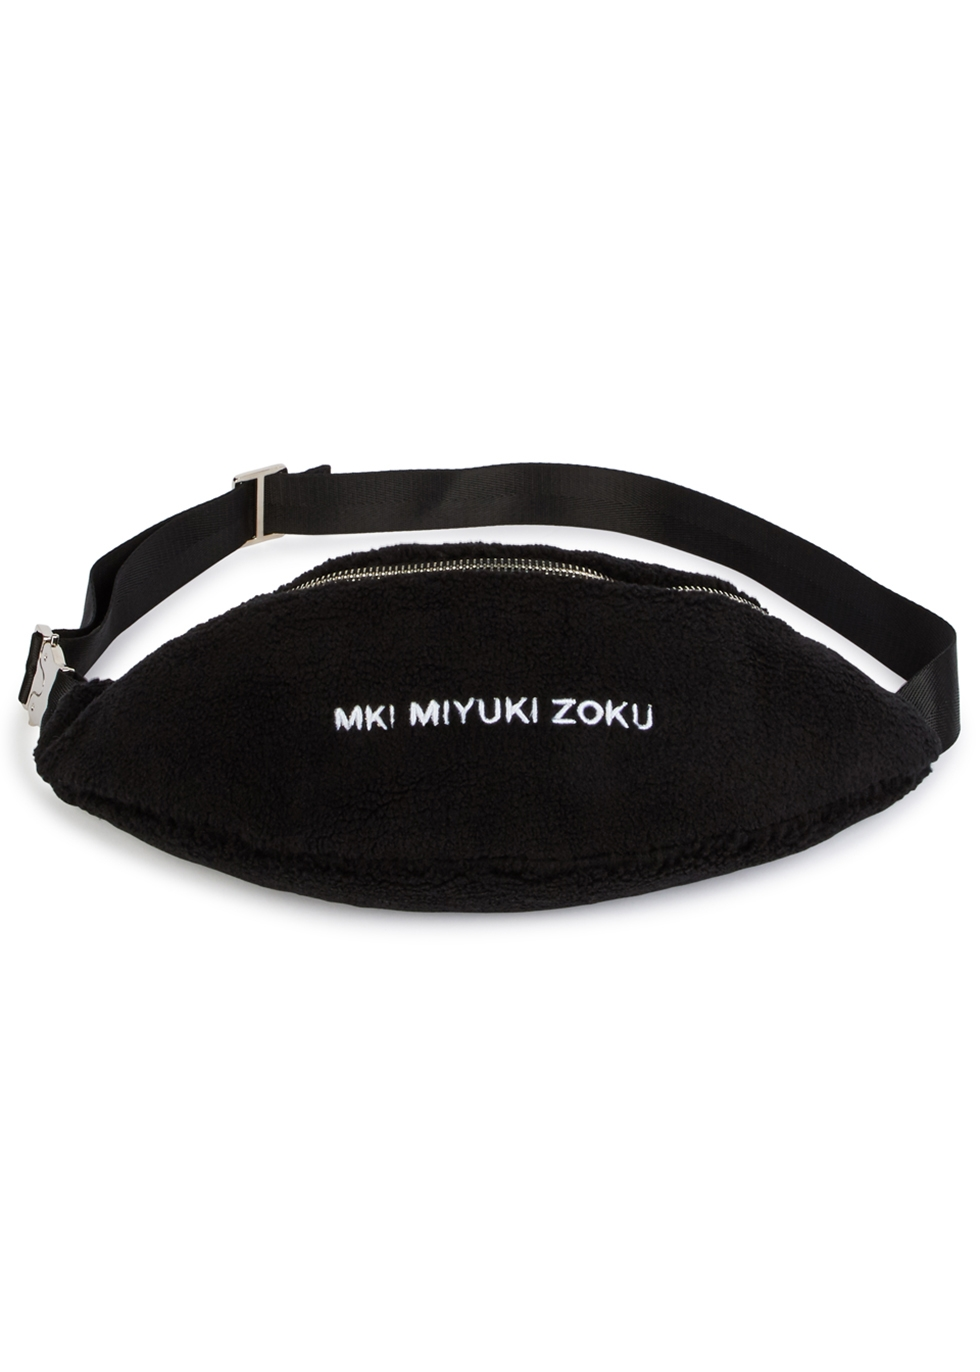 MKI MIYUKI ZOKU BLACK FLEECE BELT BAG